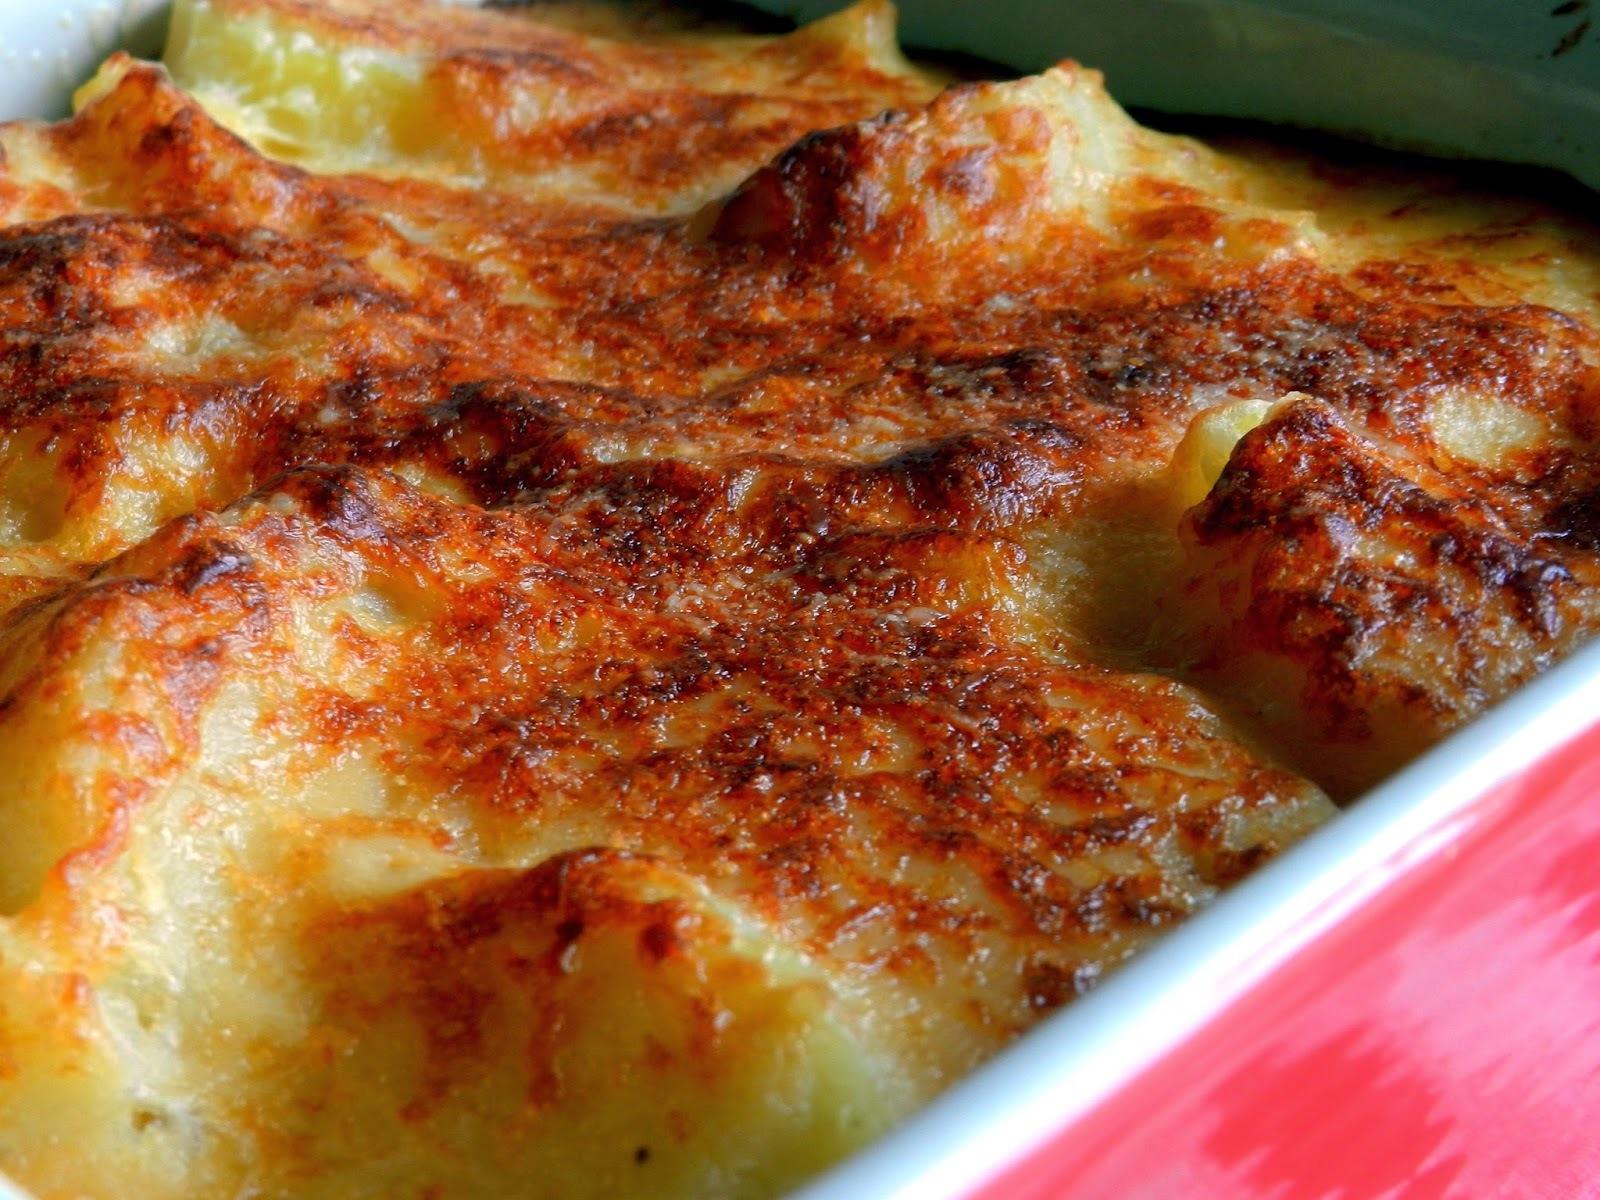 Batata gratinada basicona